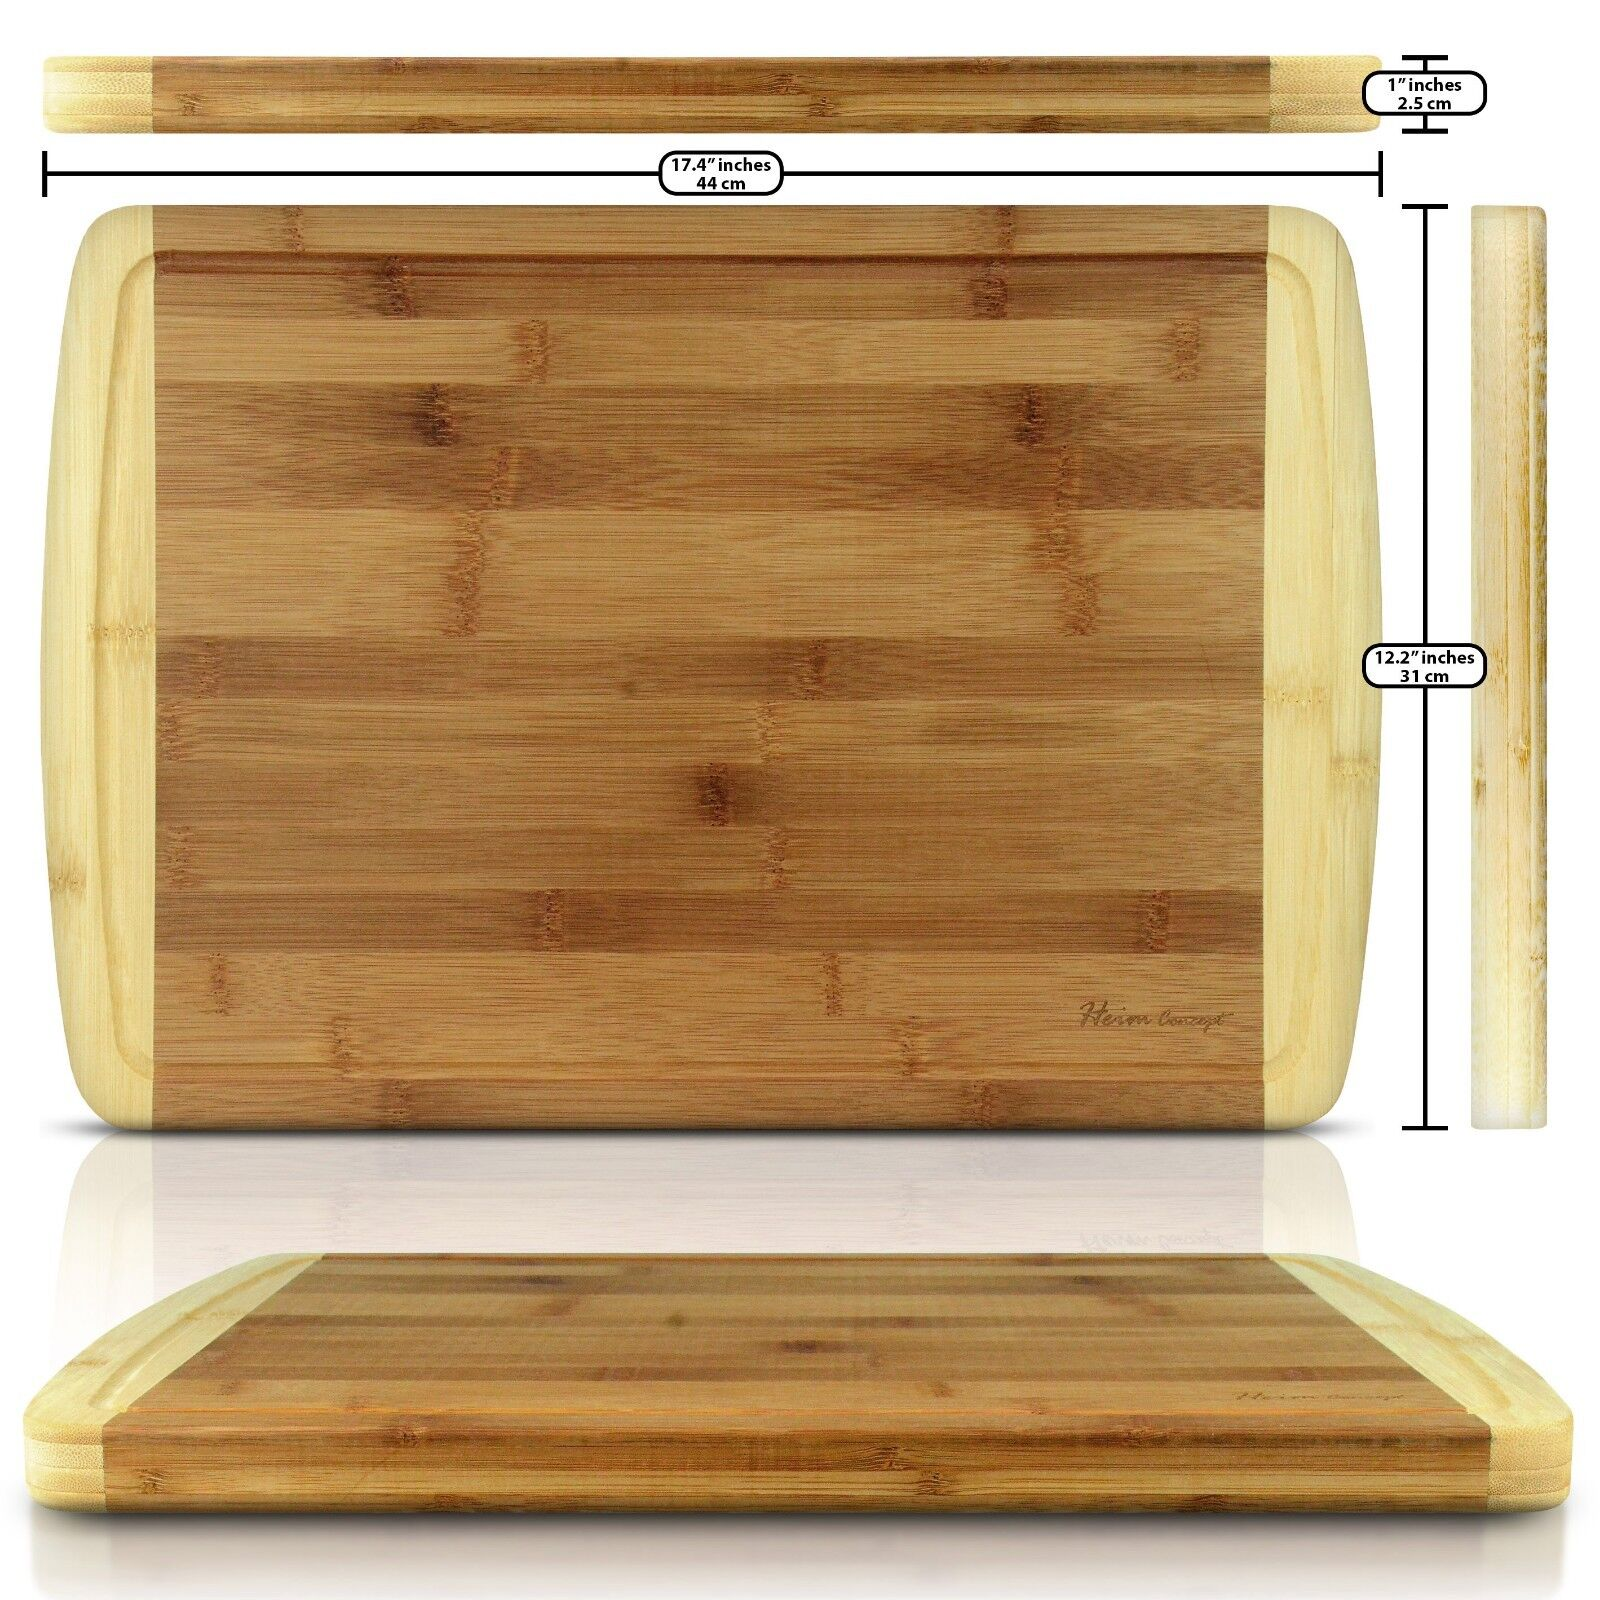 Cutting Board: HEIM's Organic Bamboo Wood Large Cutting Board Kitchen